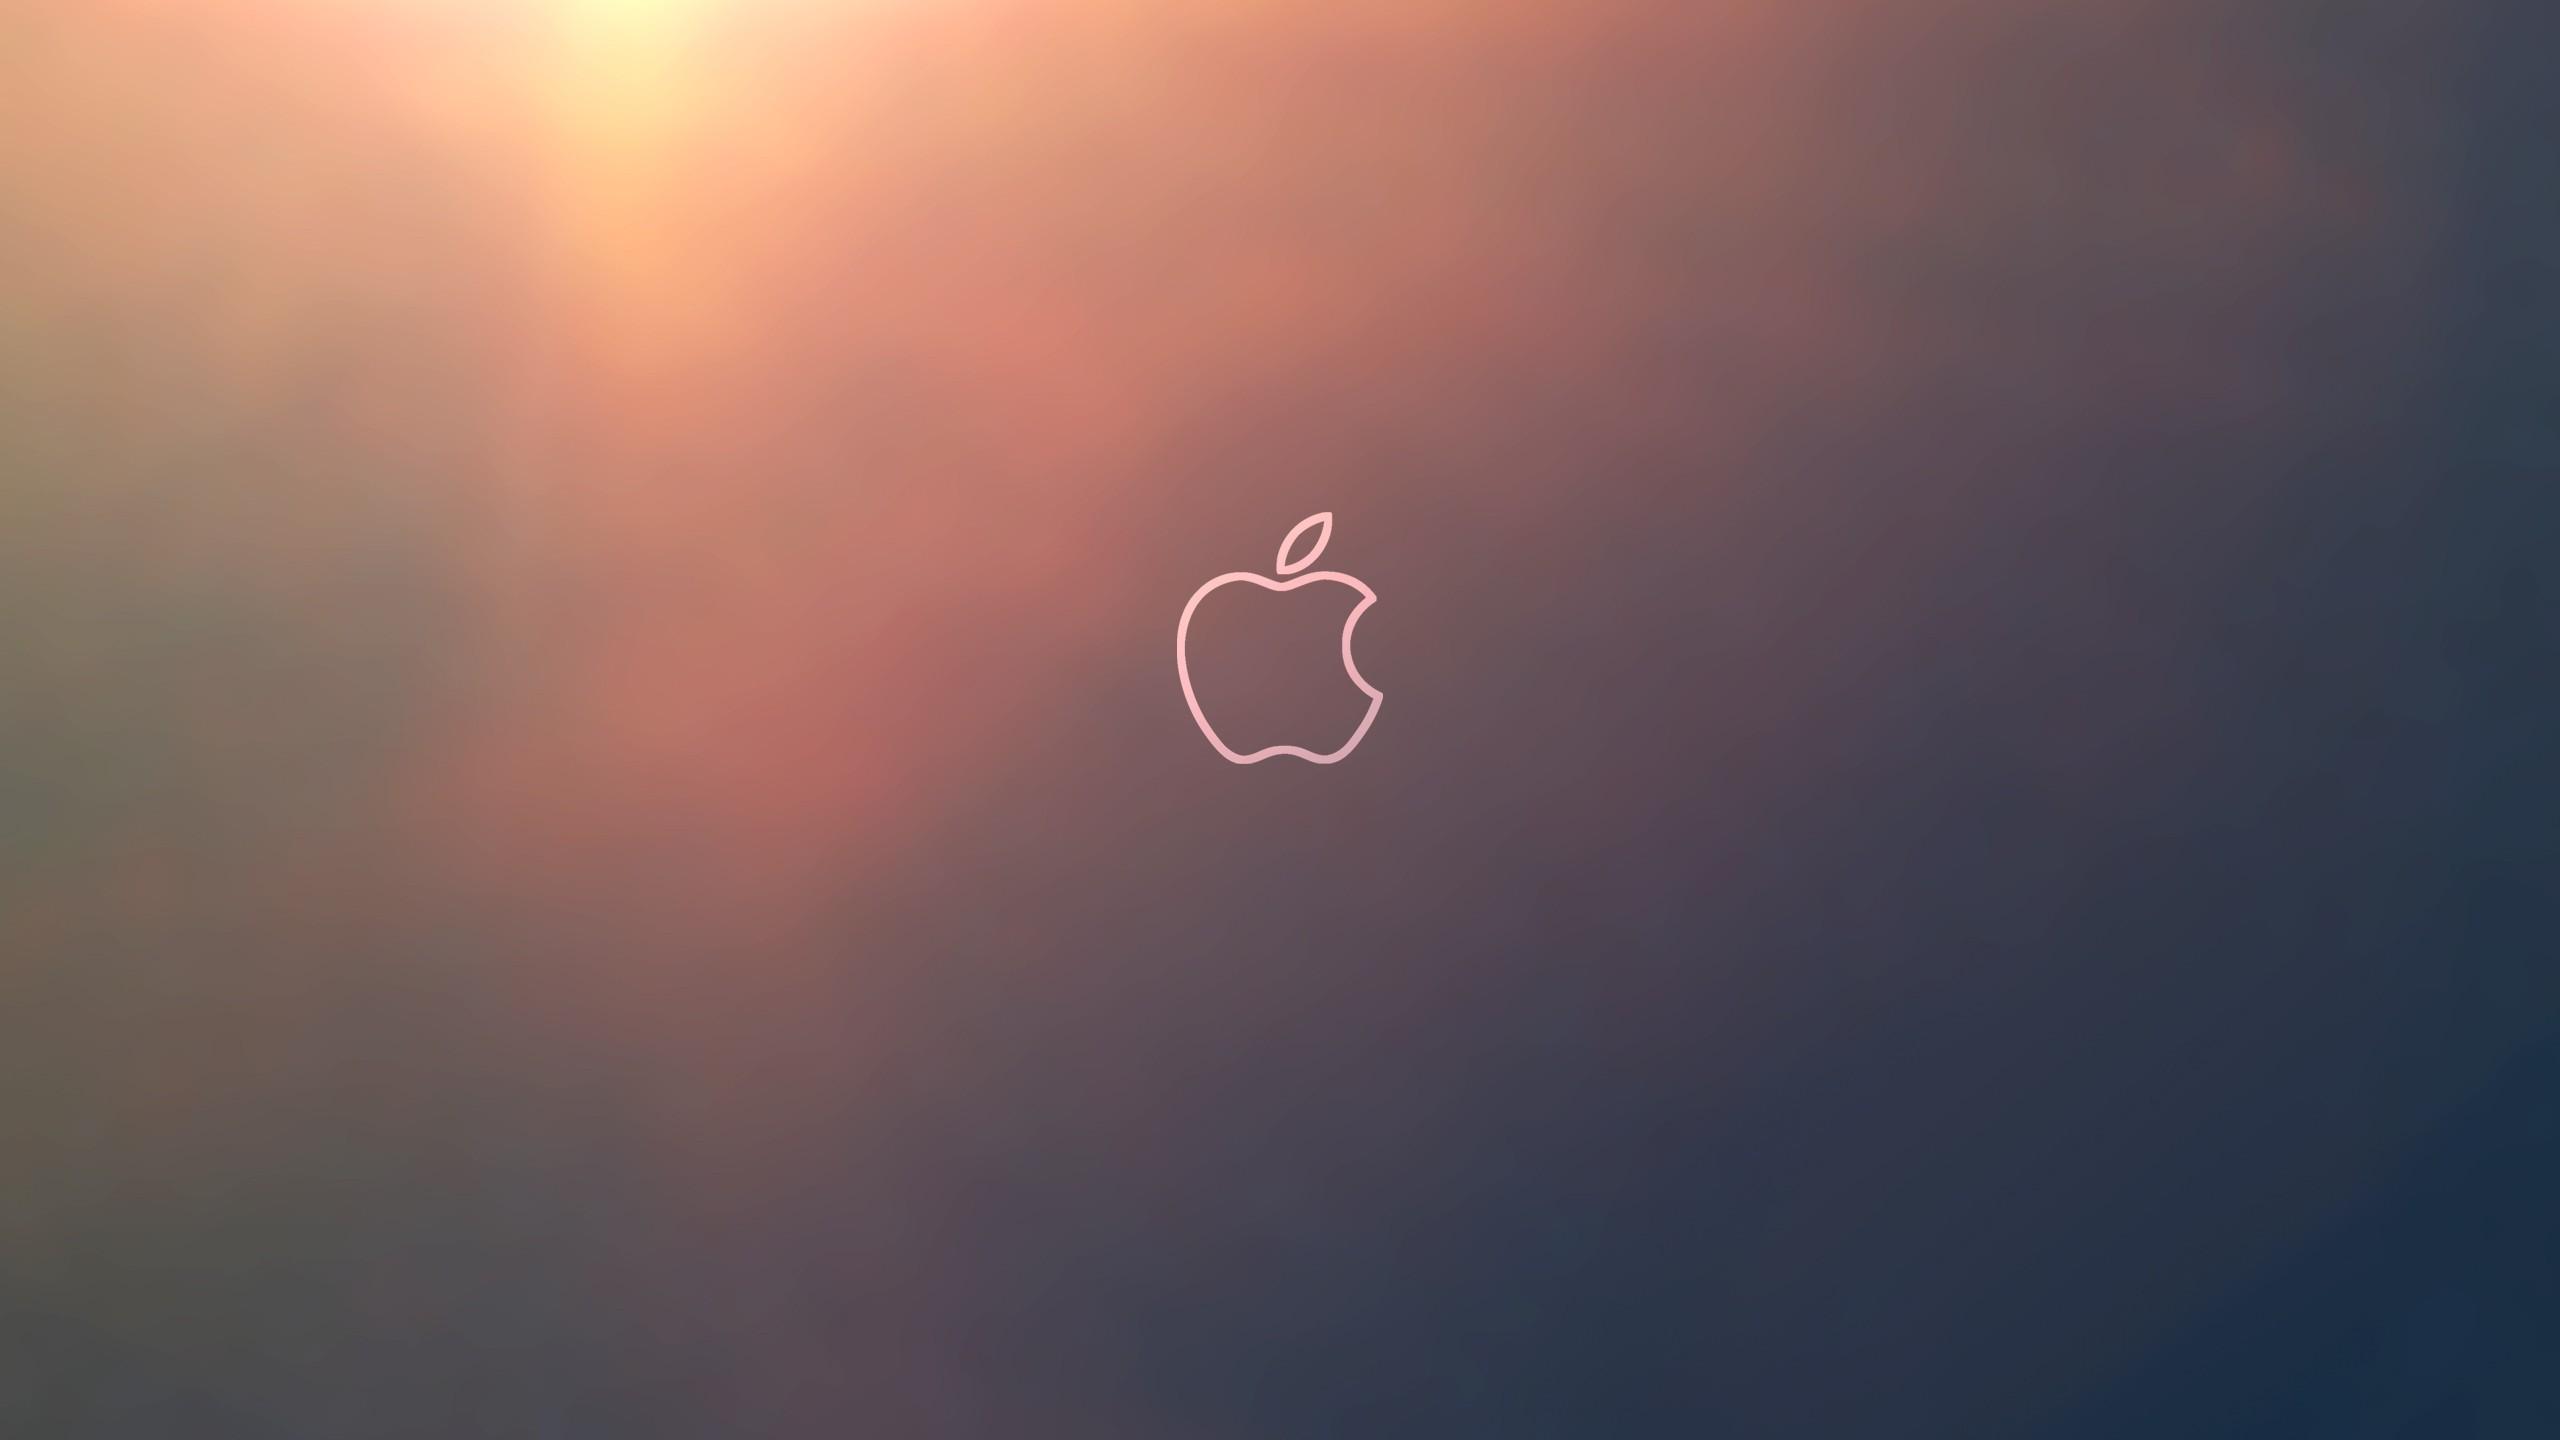 Sfondi apple 74 immagini for Sfondi belli hd